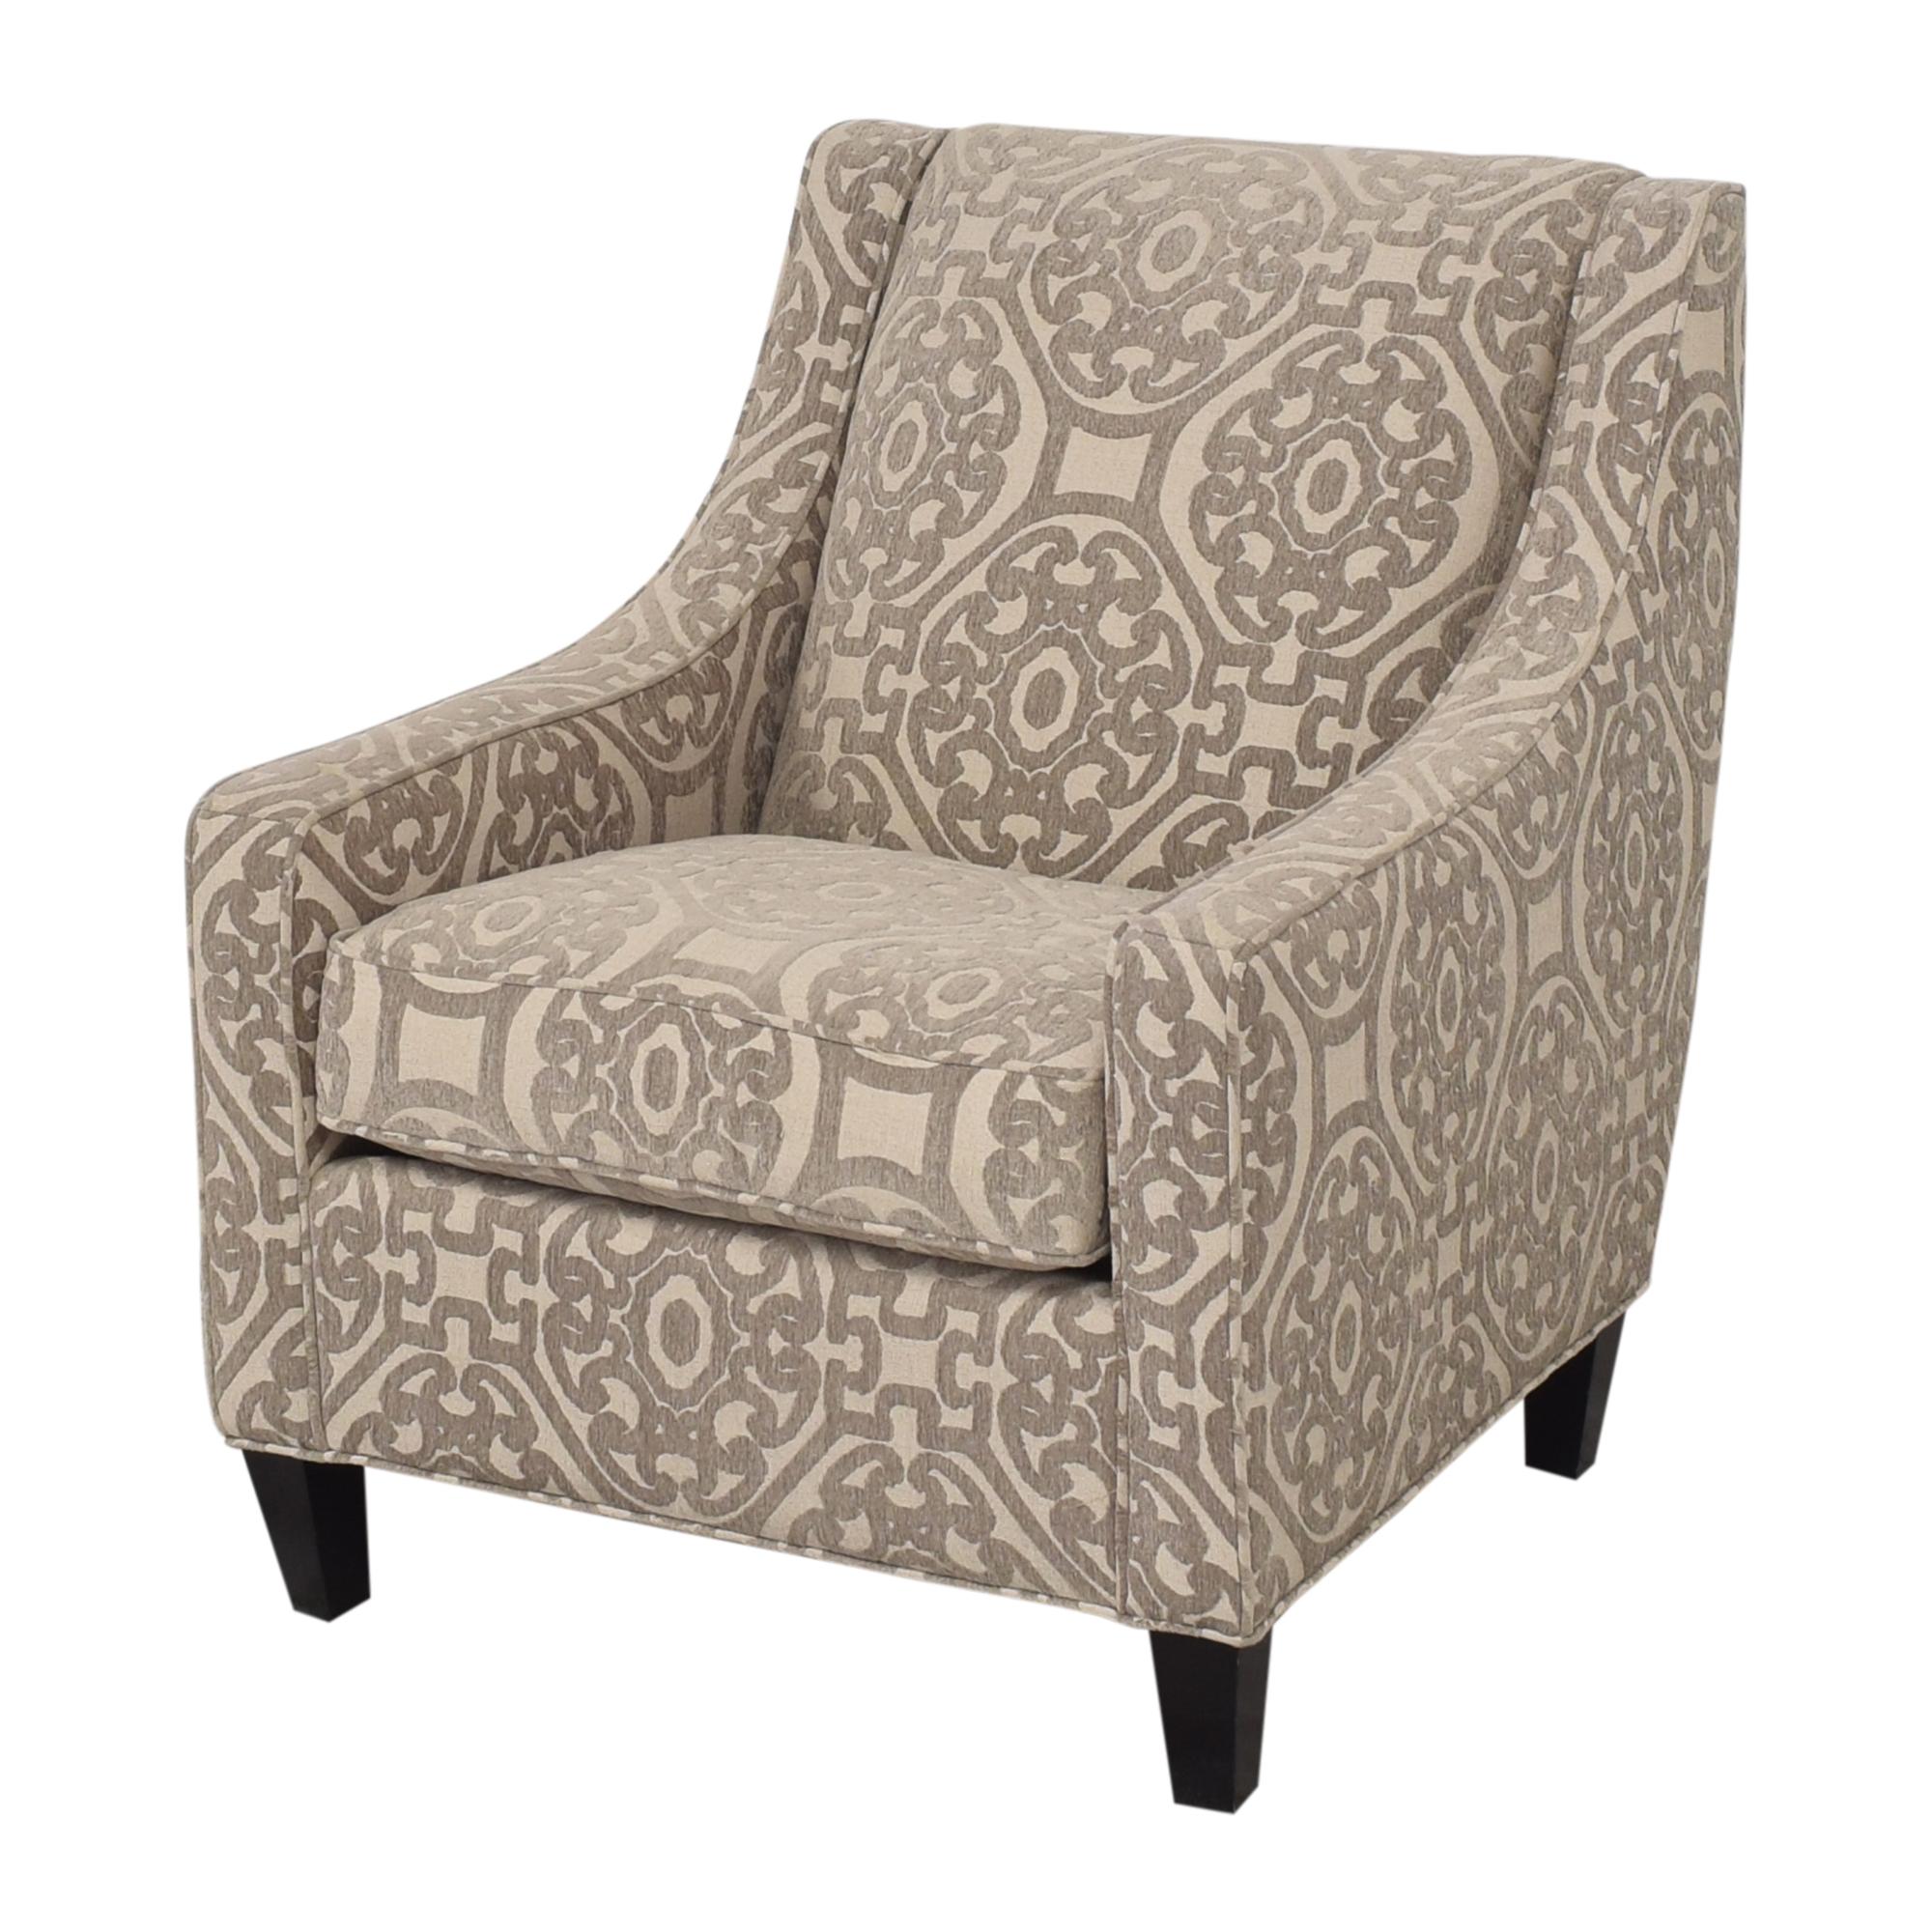 Raymour & Flanigan Raymour & Flanigan Cindy Crawford Home Calista Chair